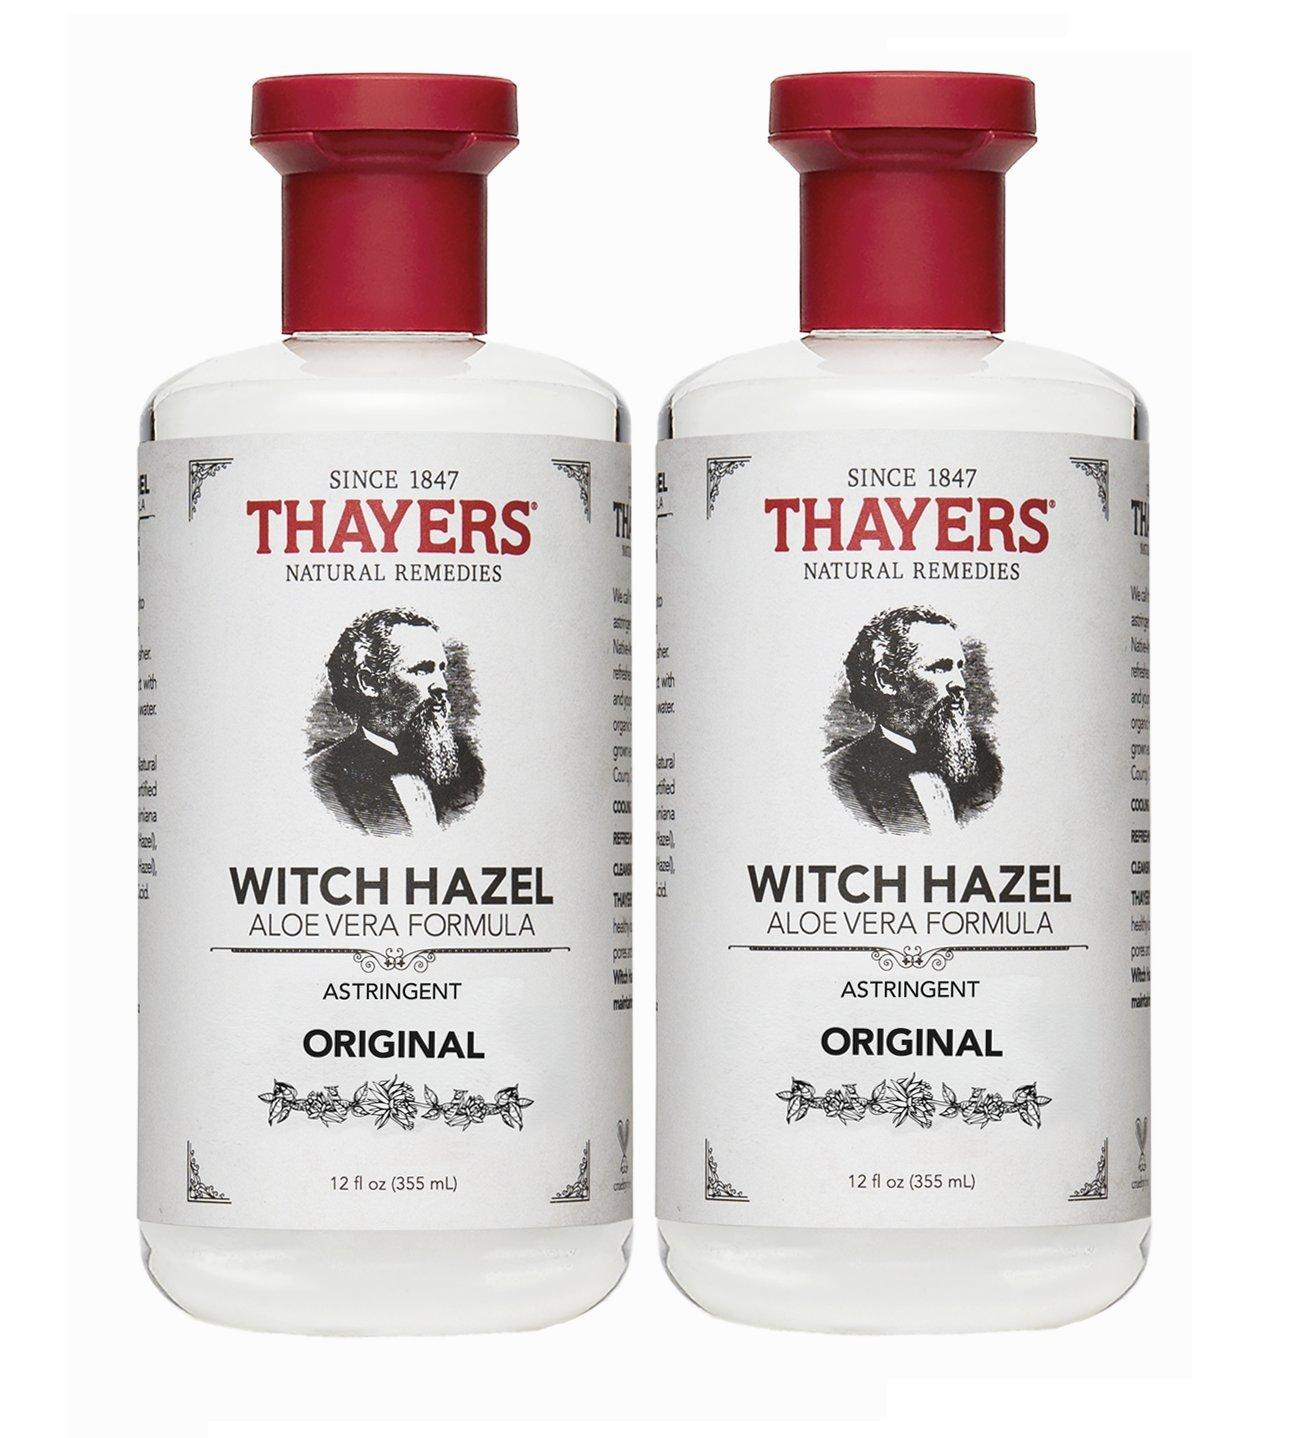 Thayers Witch Hazel with Aloe Vera, Original Astringent, 12 Fl Oz (Pack of 2)